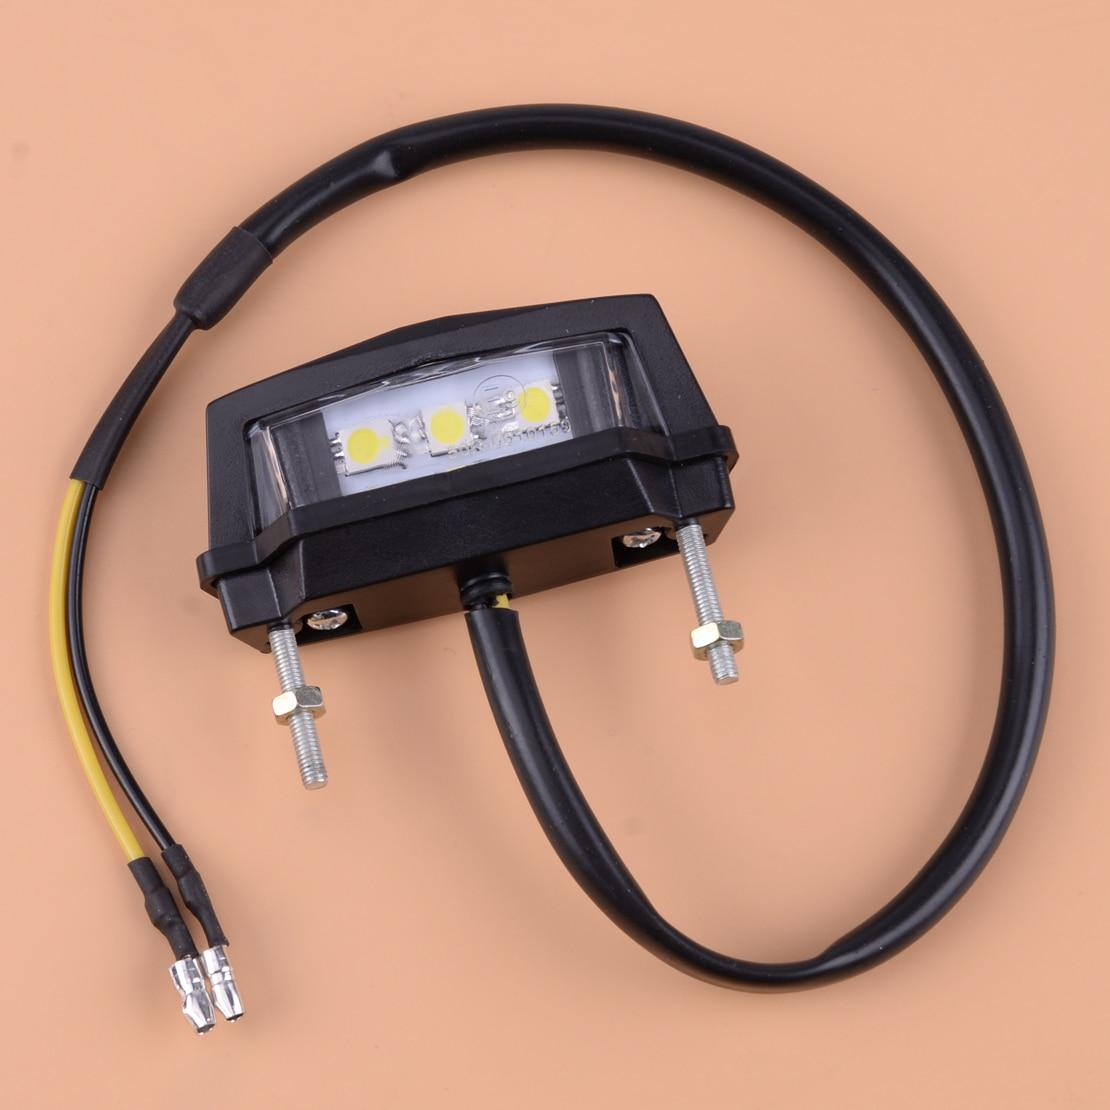 DC 12V Motorcycle License Plate Mount Holder Bracket LED Tail Brake Light Lamp Indicator Fit For Off-Road Vehicles ATV